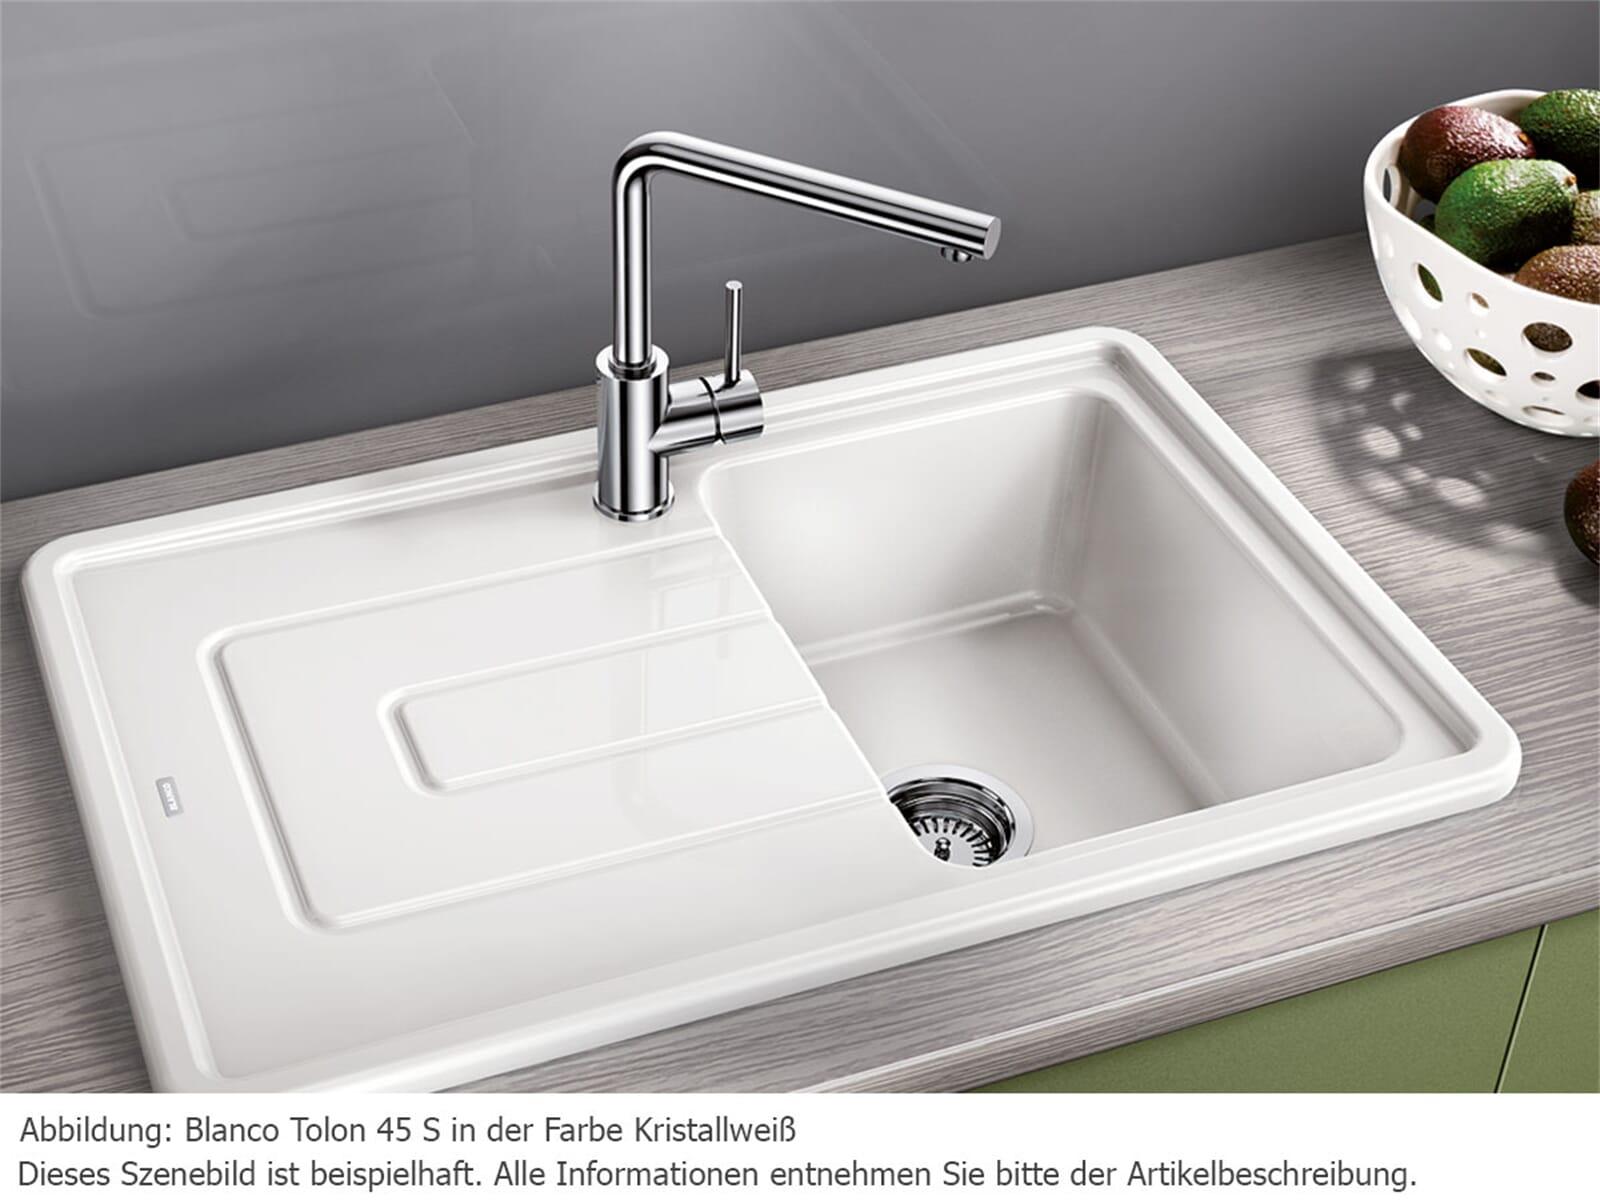 Blanco Tolon 45 S Kristallweiß Glänzend Keramikspüle